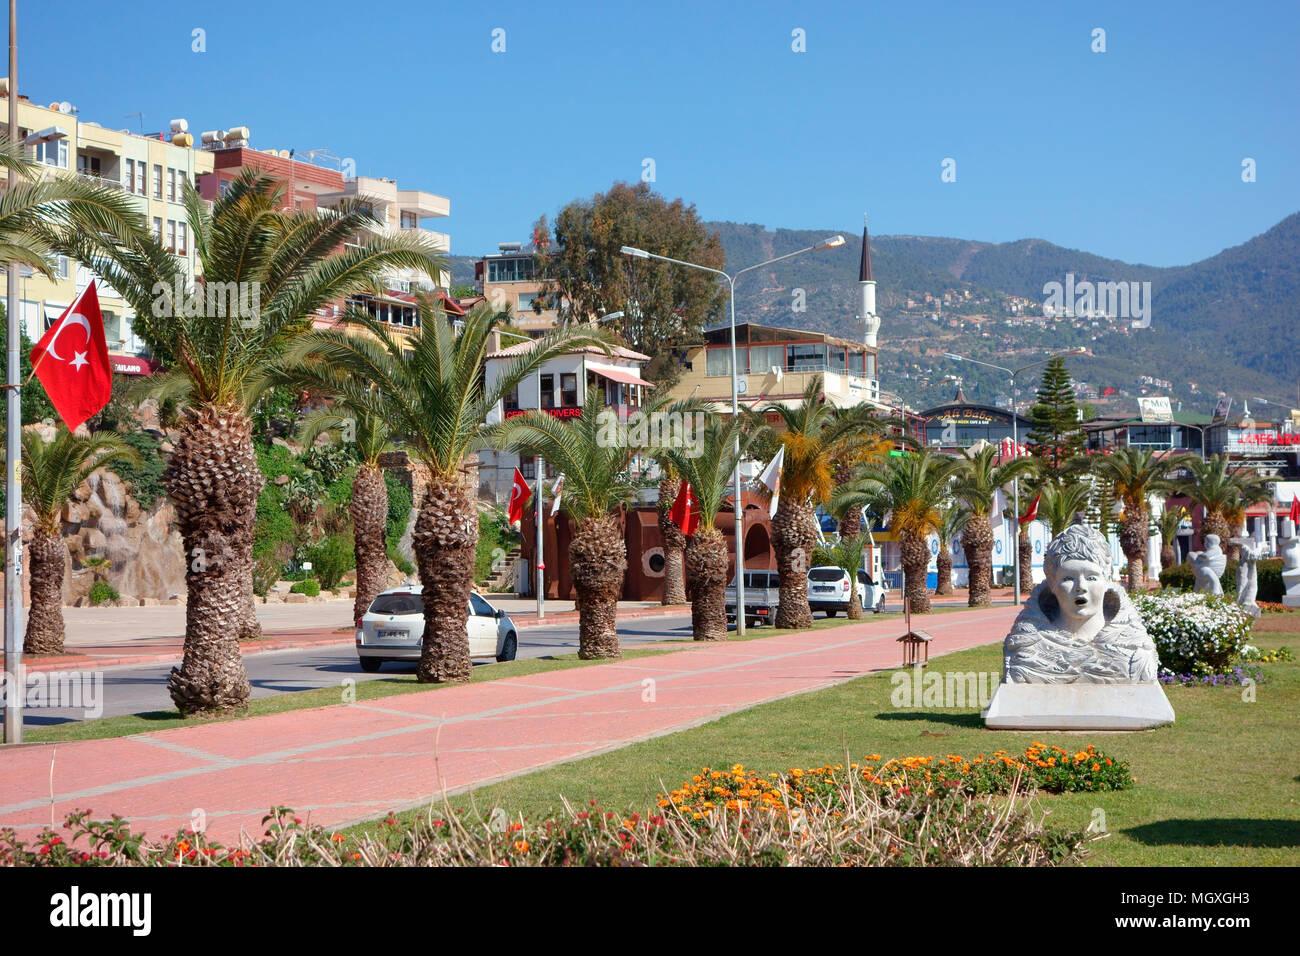 Alanya Promenade, Alanya, Mediterannean, Turkey - Stock Image